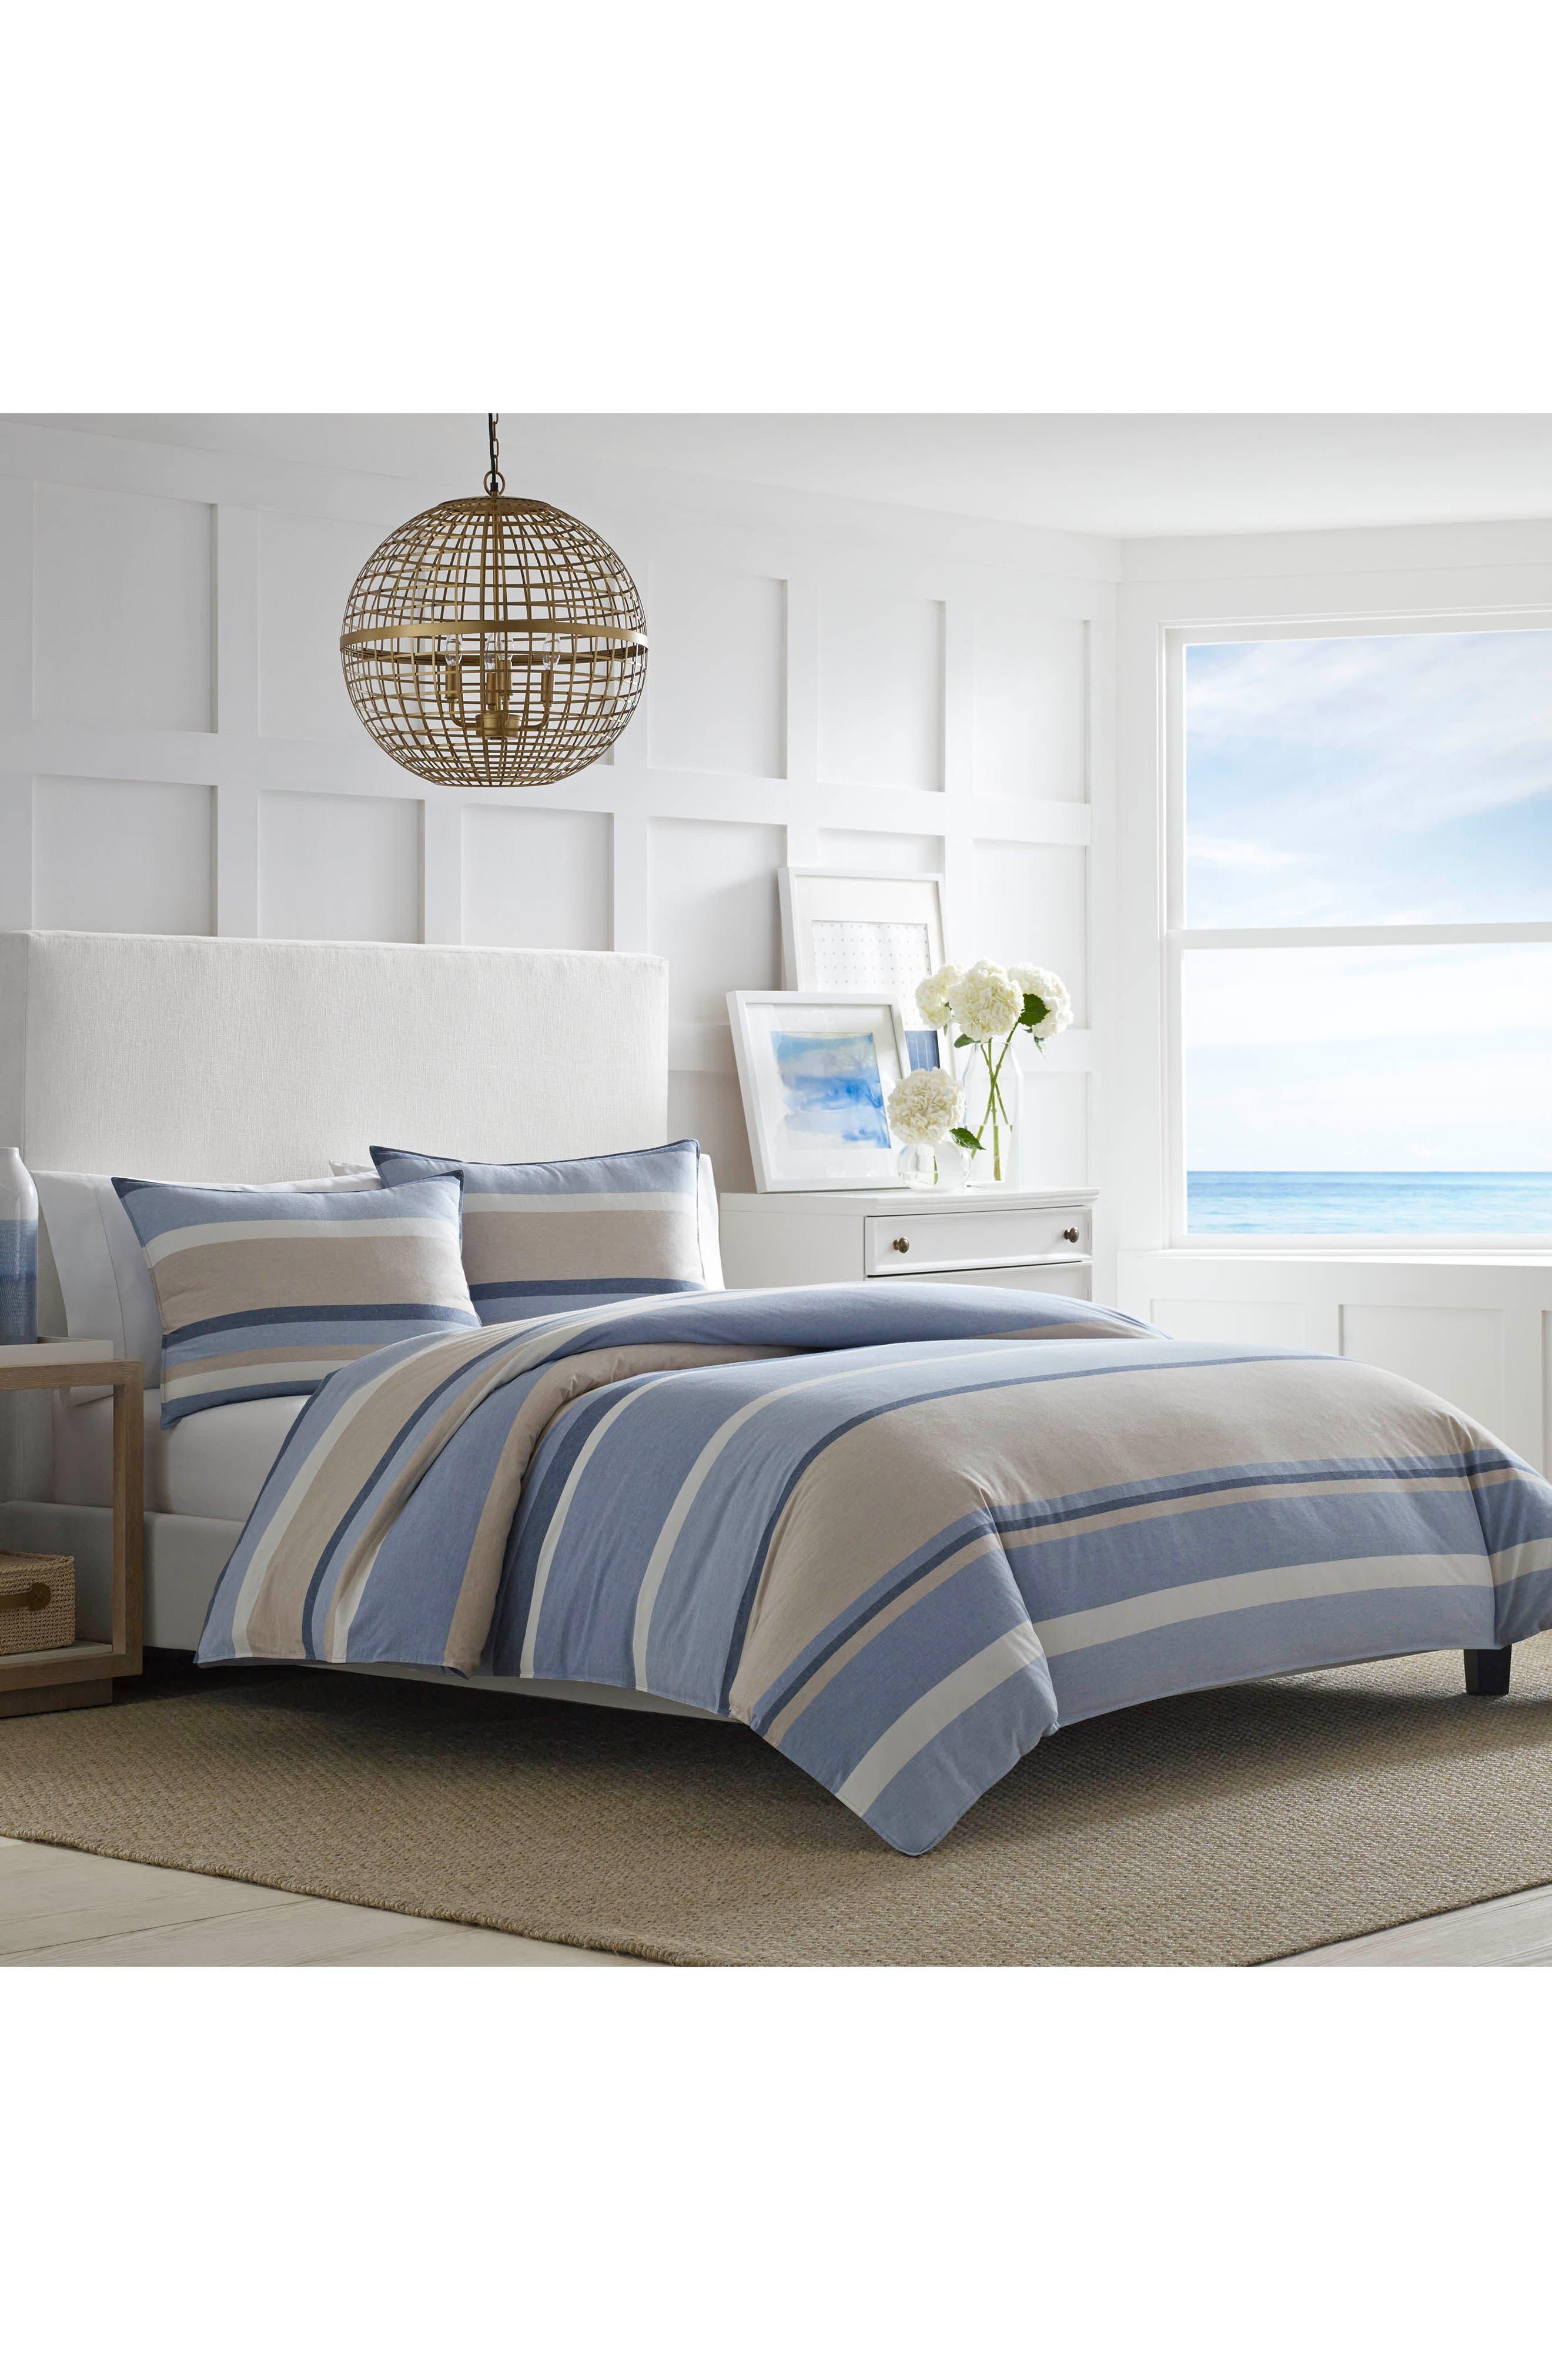 Abbot Comforter & Sham Set,                         Main,                         color, Medium Blue